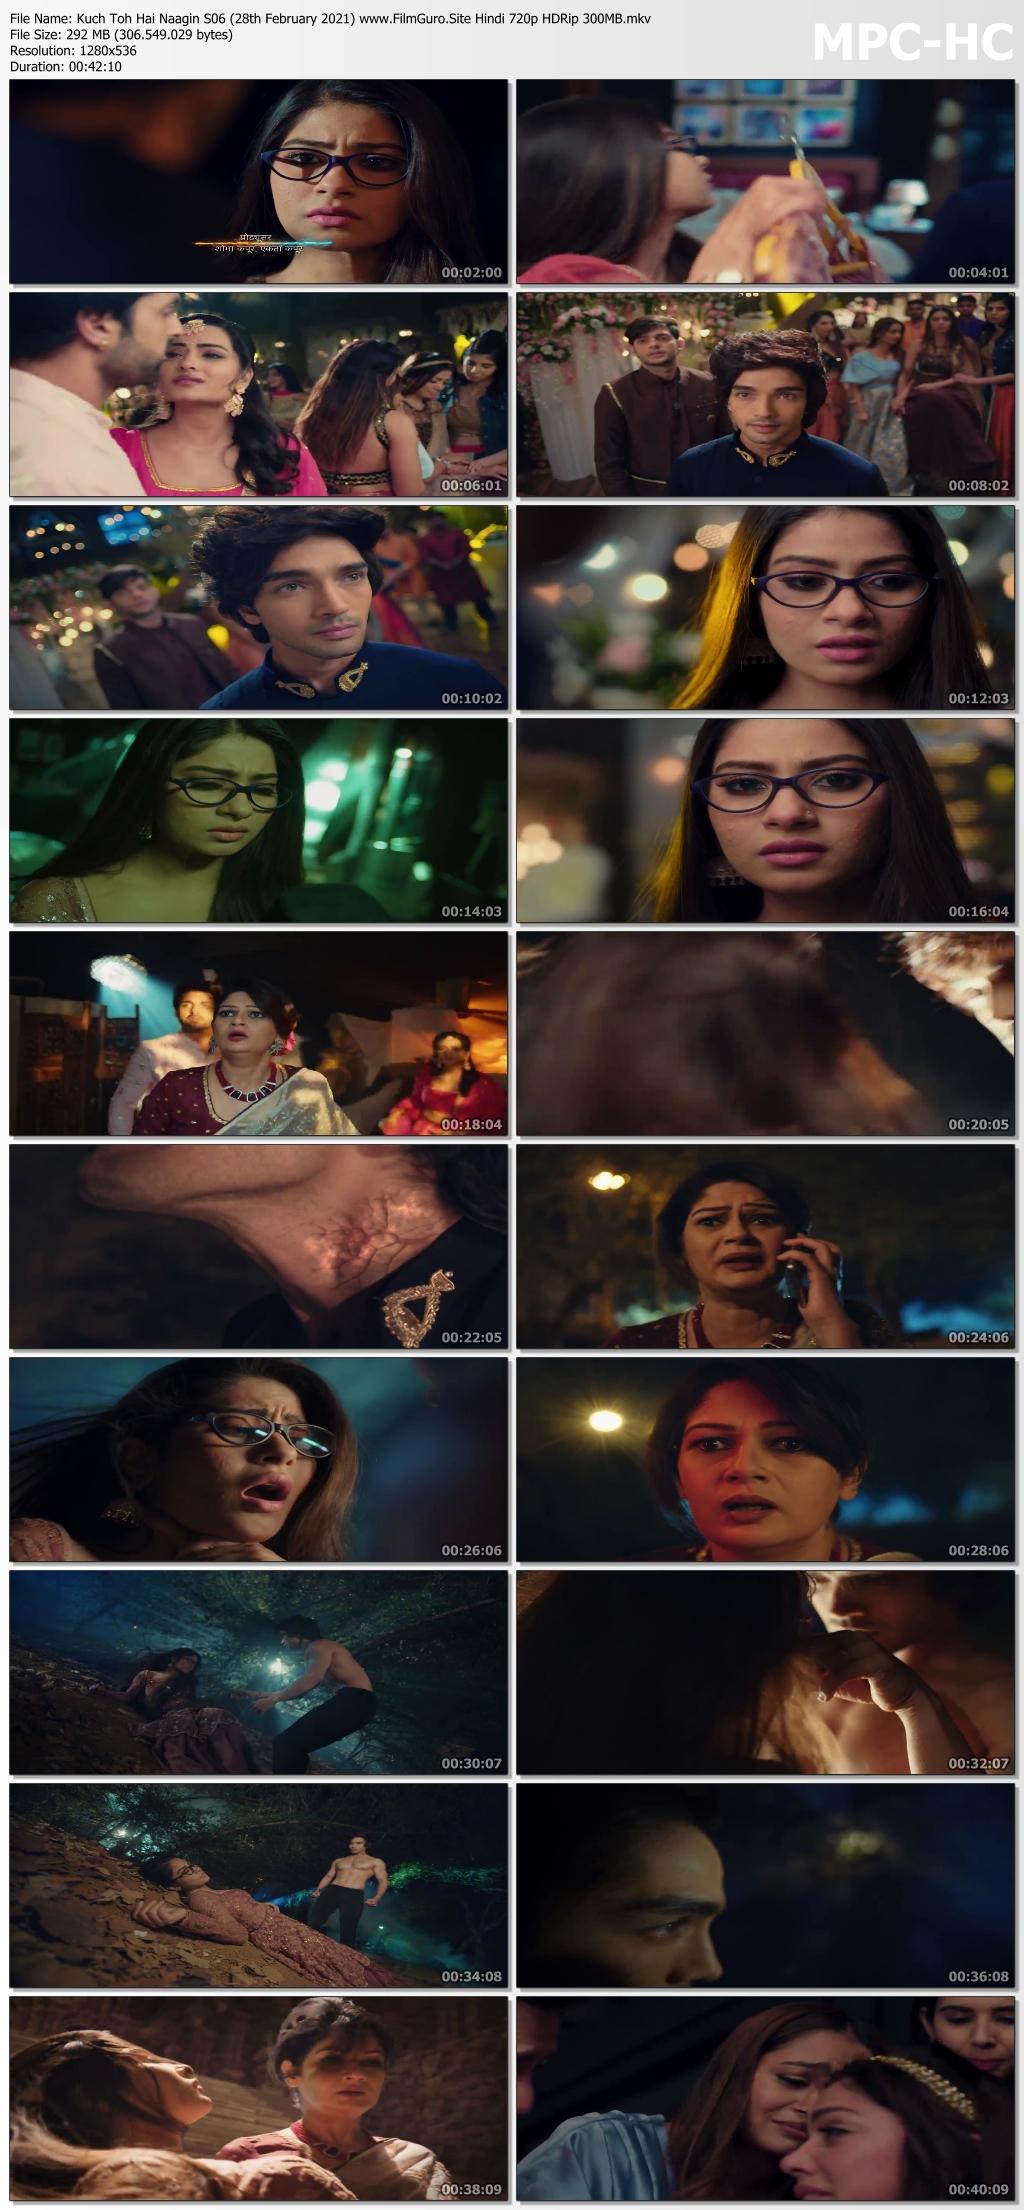 Kuch-Toh-Hai-Naagin-S06-28th-February-2021-www-Film-Guro-Site-Hindi-720p-HDRip-300-MB-mkv-thumbs